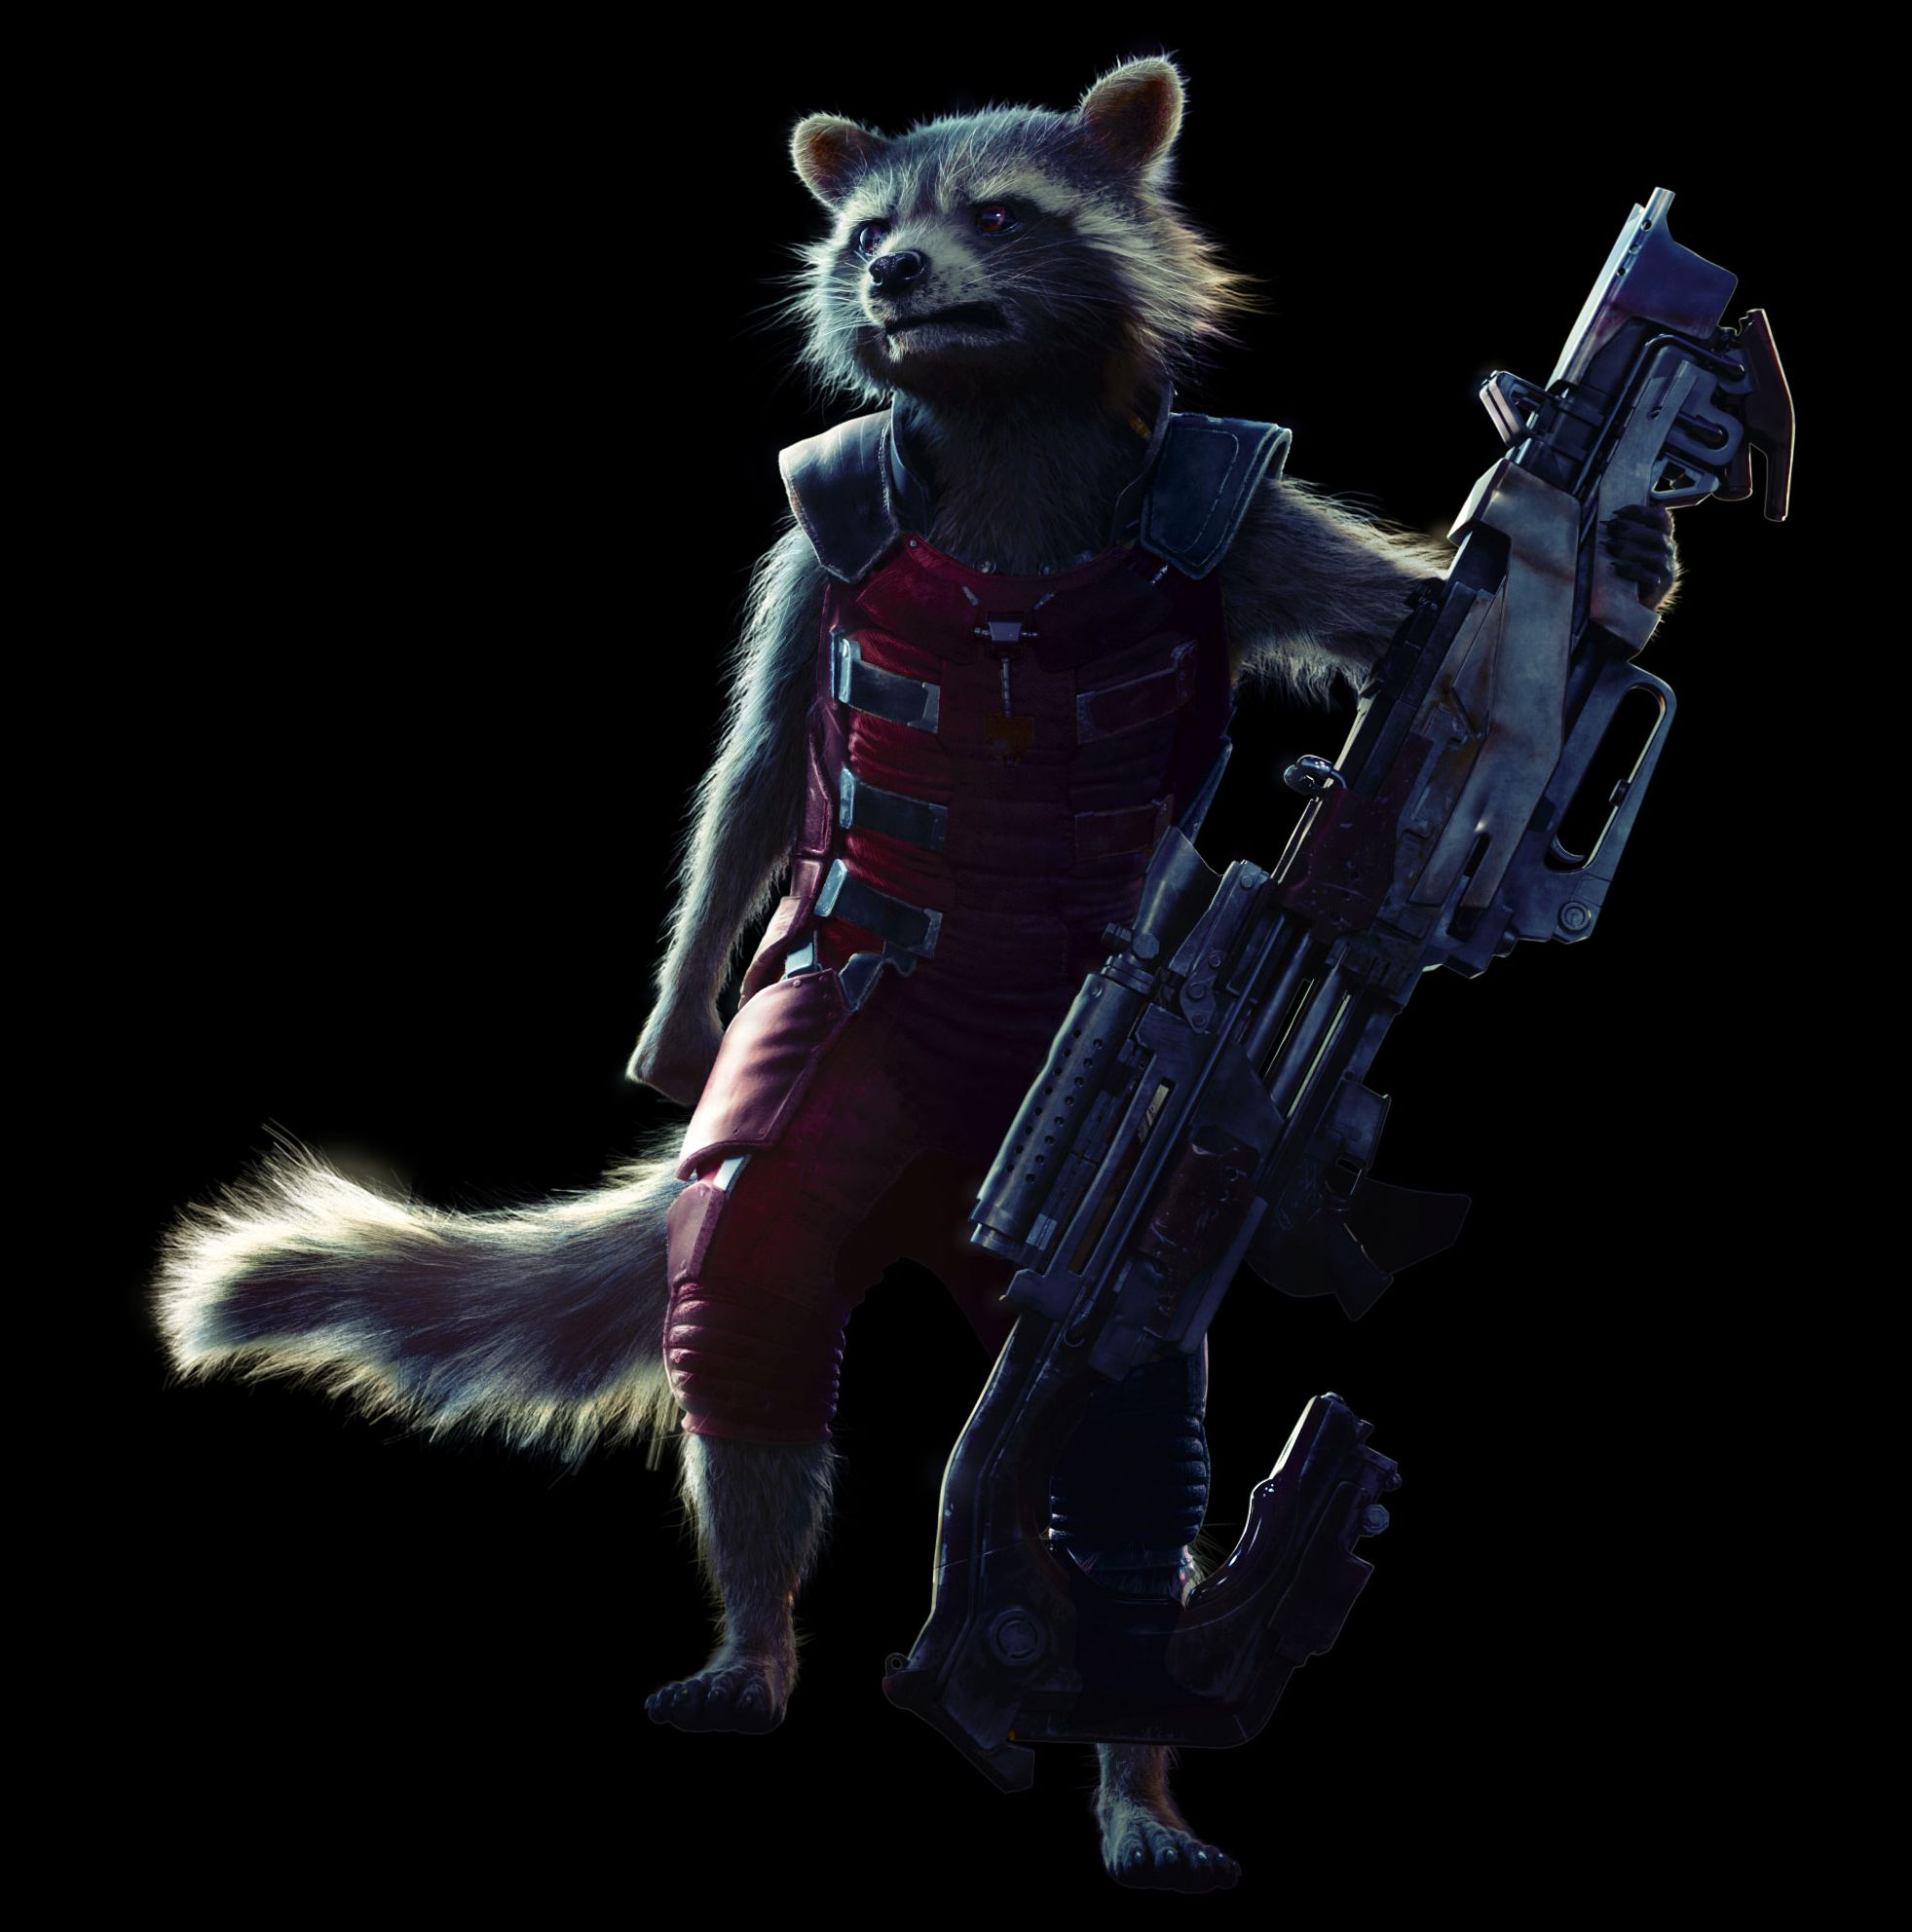 Bradley Cooper as Rocket Raccoon character